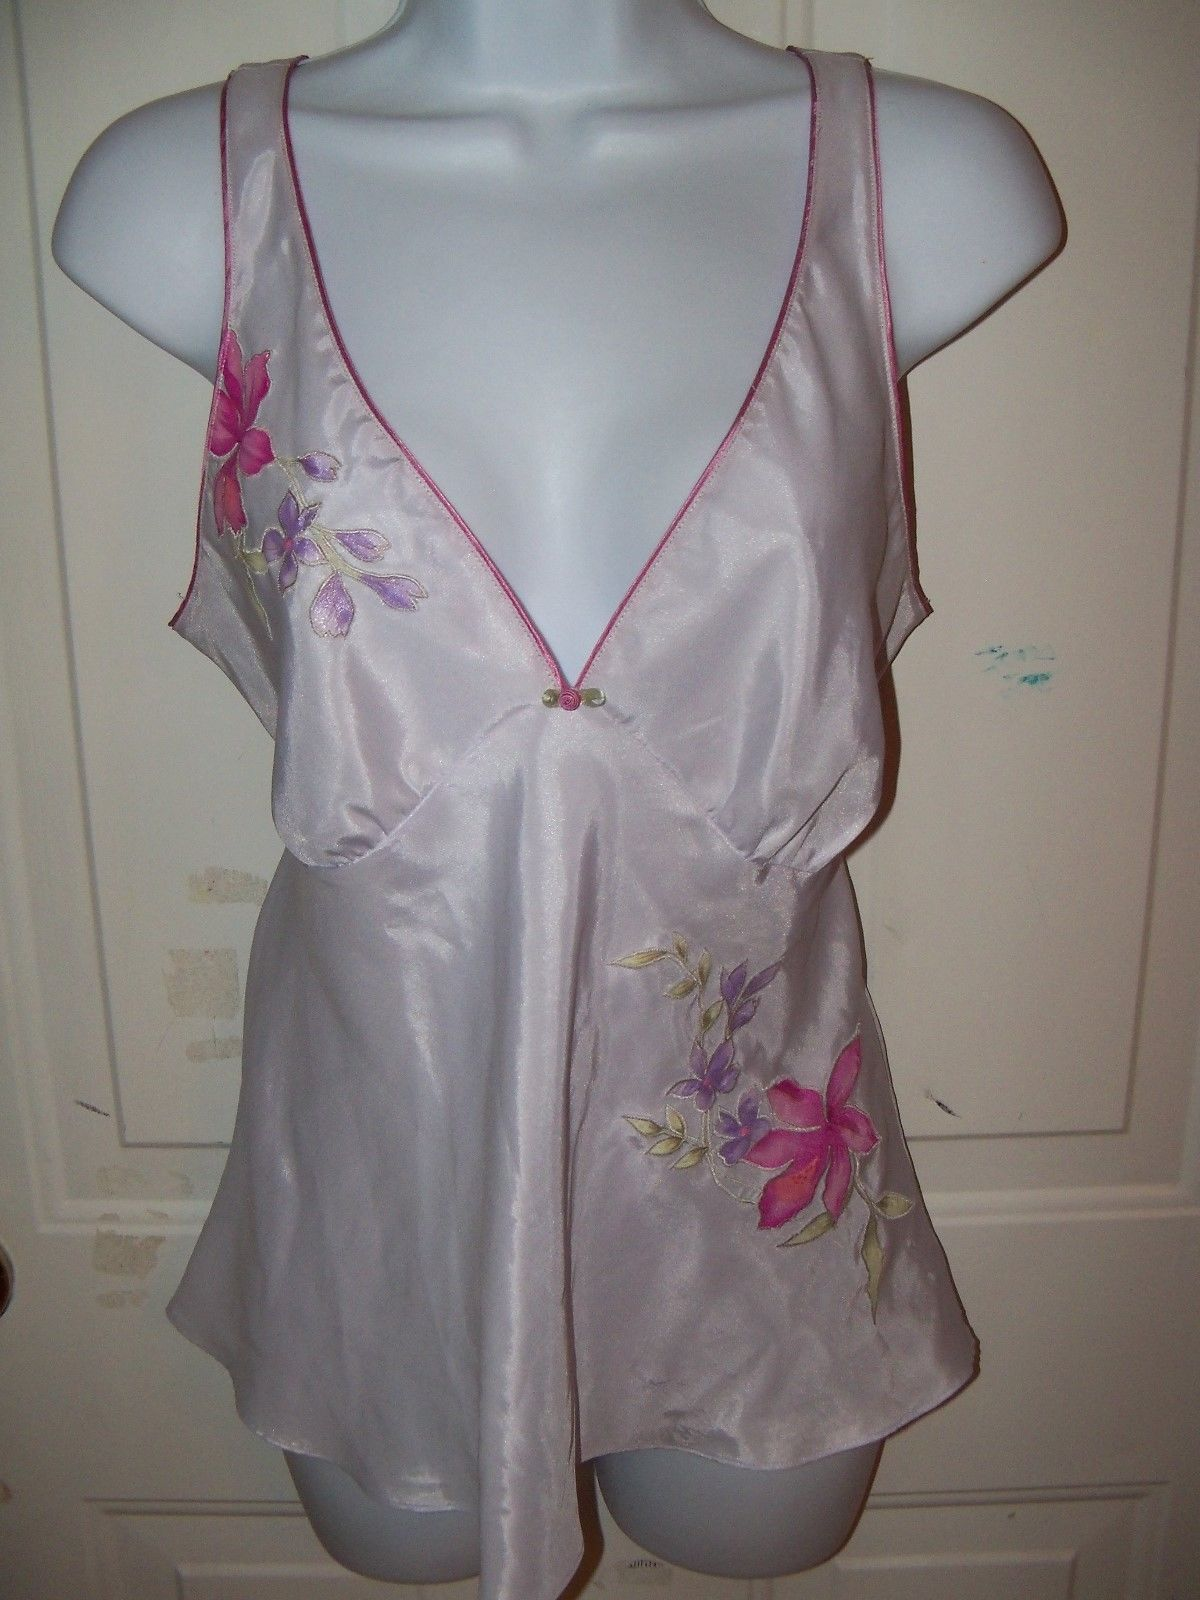 Oscar De La Renta Pink Label Cami Lavender W/Floral Tank Top Sleep Wear Size M - $30.99